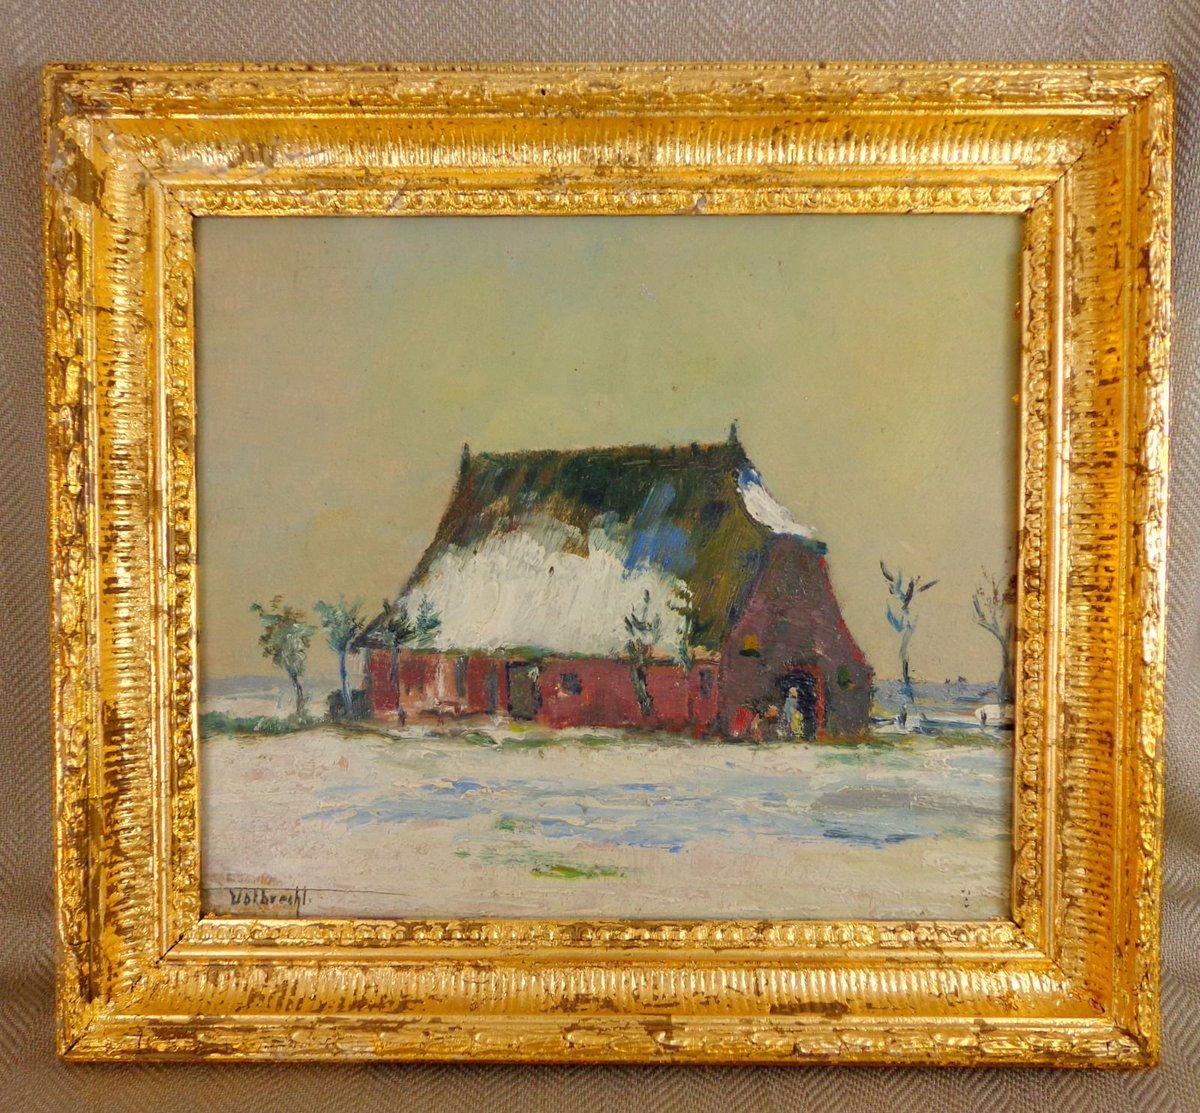 Antique German Expressionist Original Oil Painting - Winter Landscape Ernst Volbrecht (Hannover 1877 - Hamburg 1954) #FineArt #AntiquePainting #OilPainting #Expressionism #Art   https://bit.ly/2DMwqsJ